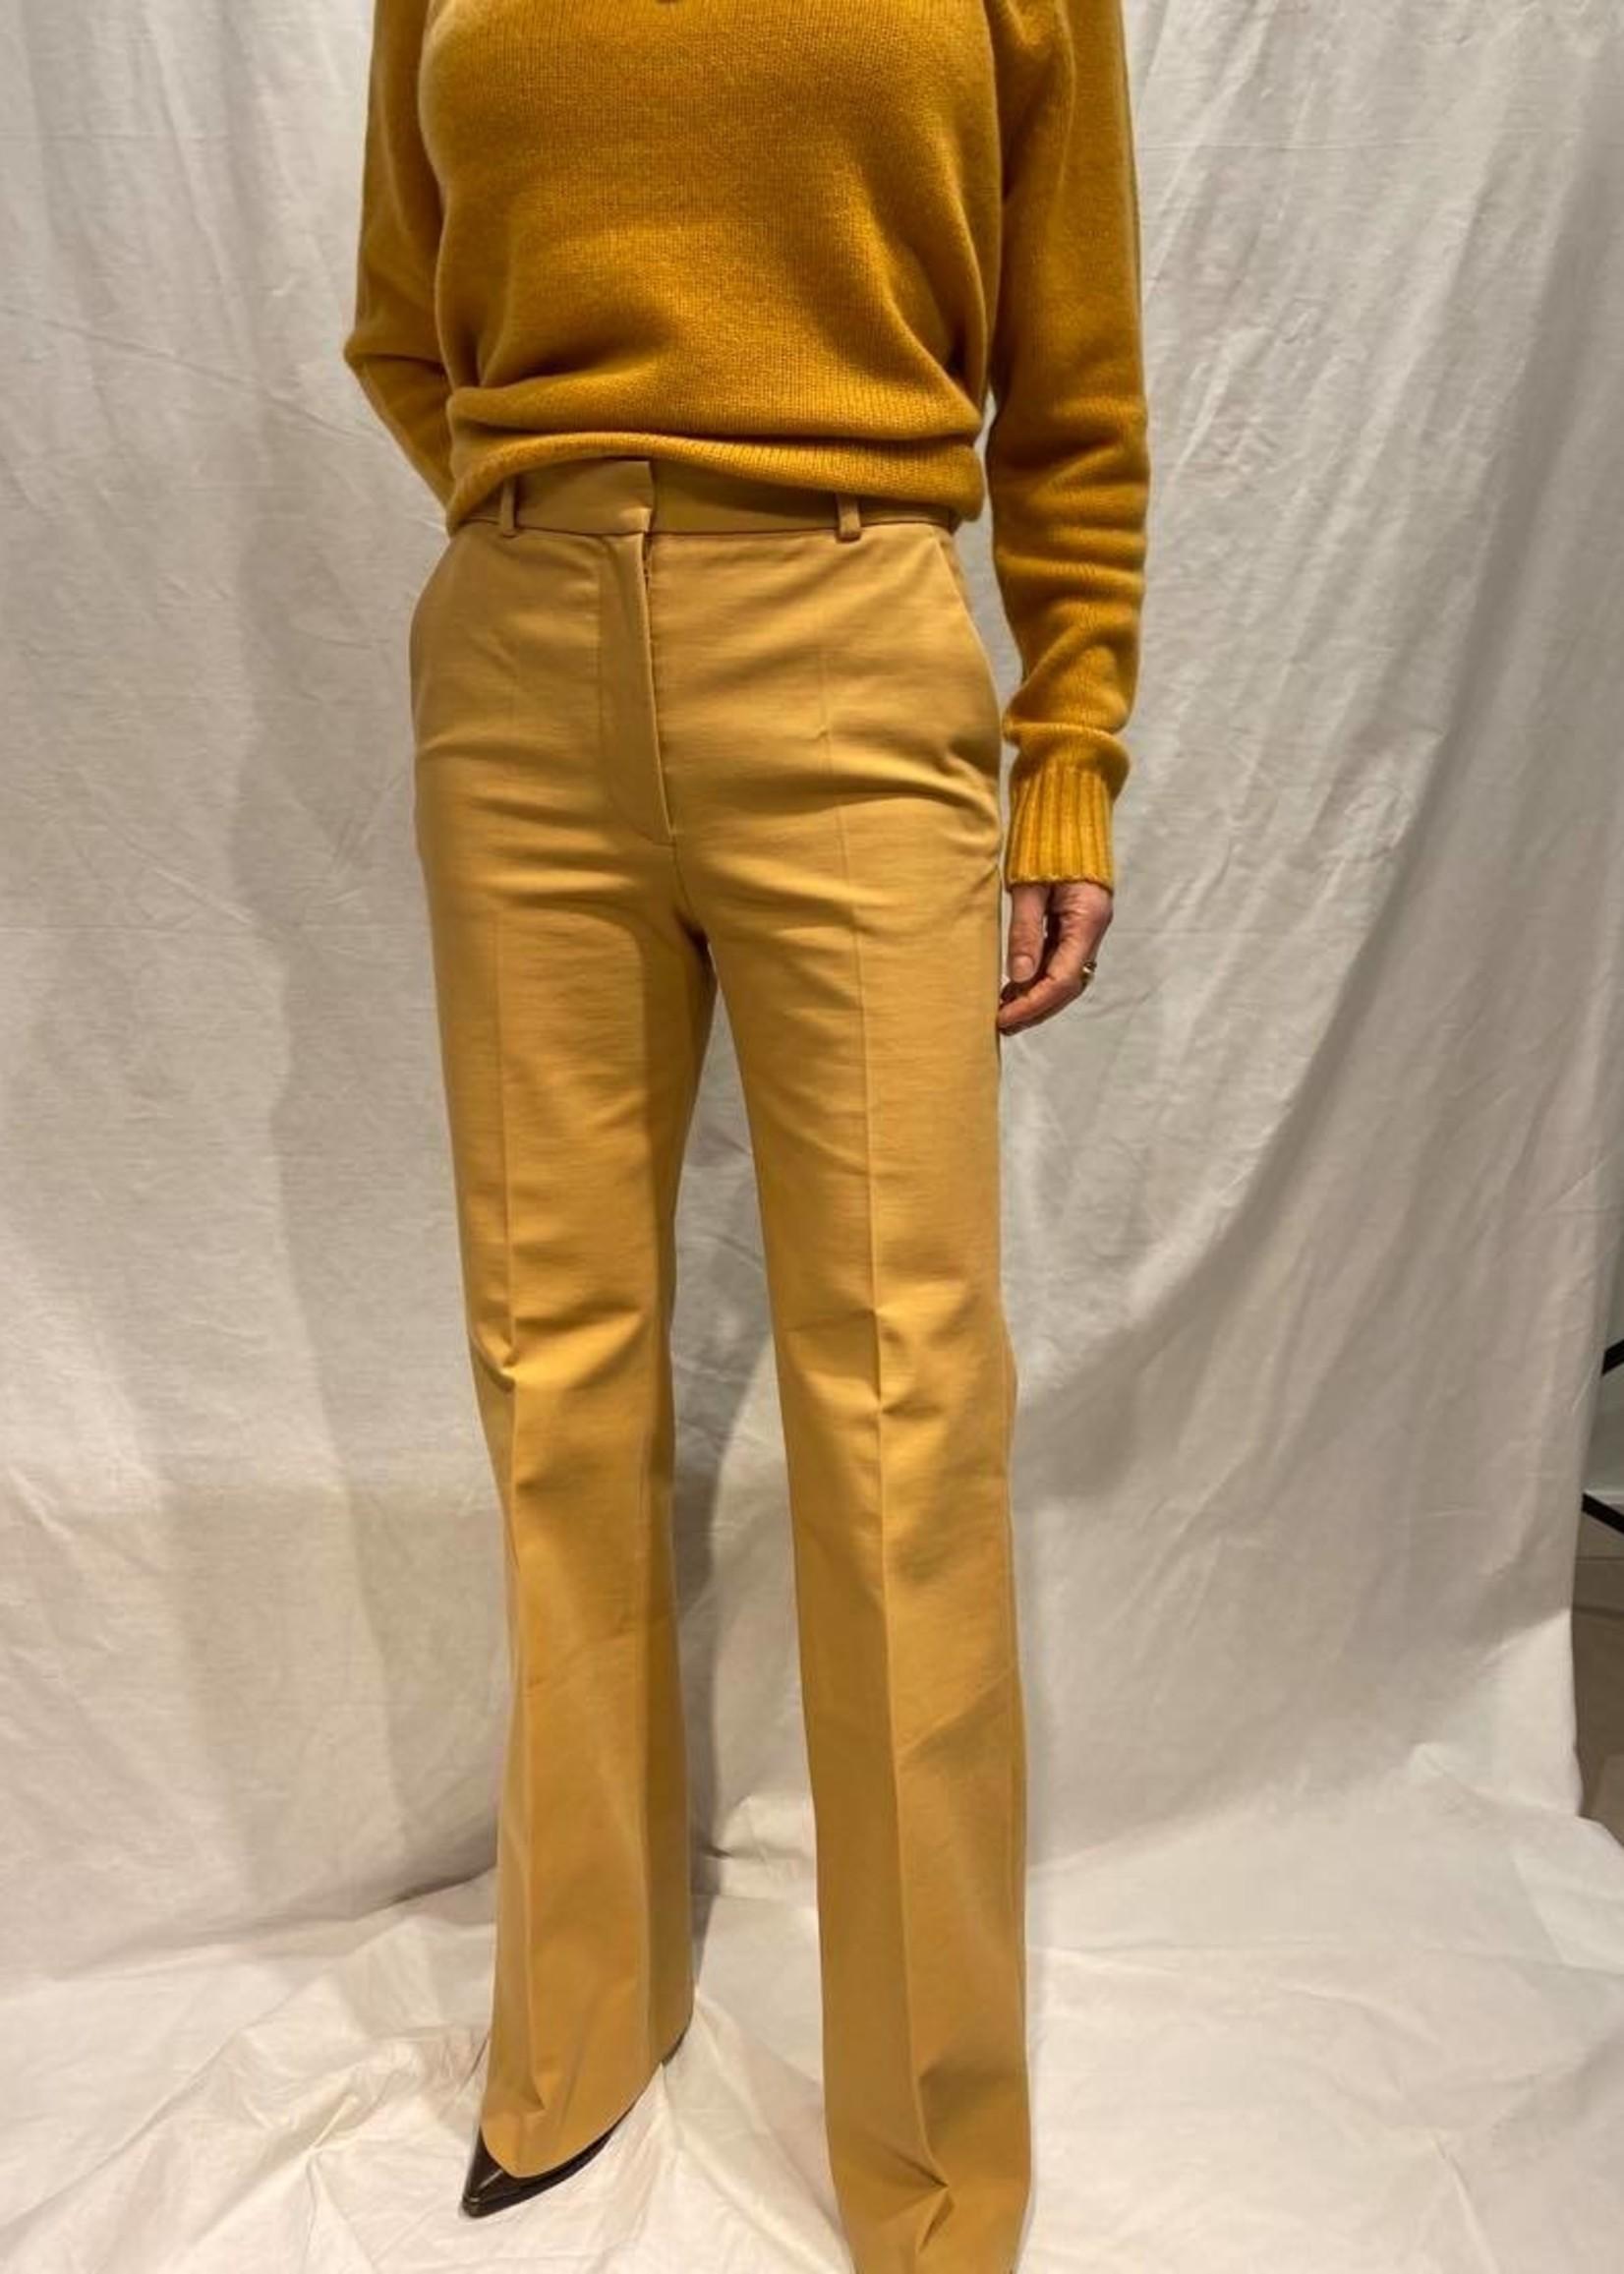 Joseph joseph richard bi strech straight leg pants, oak